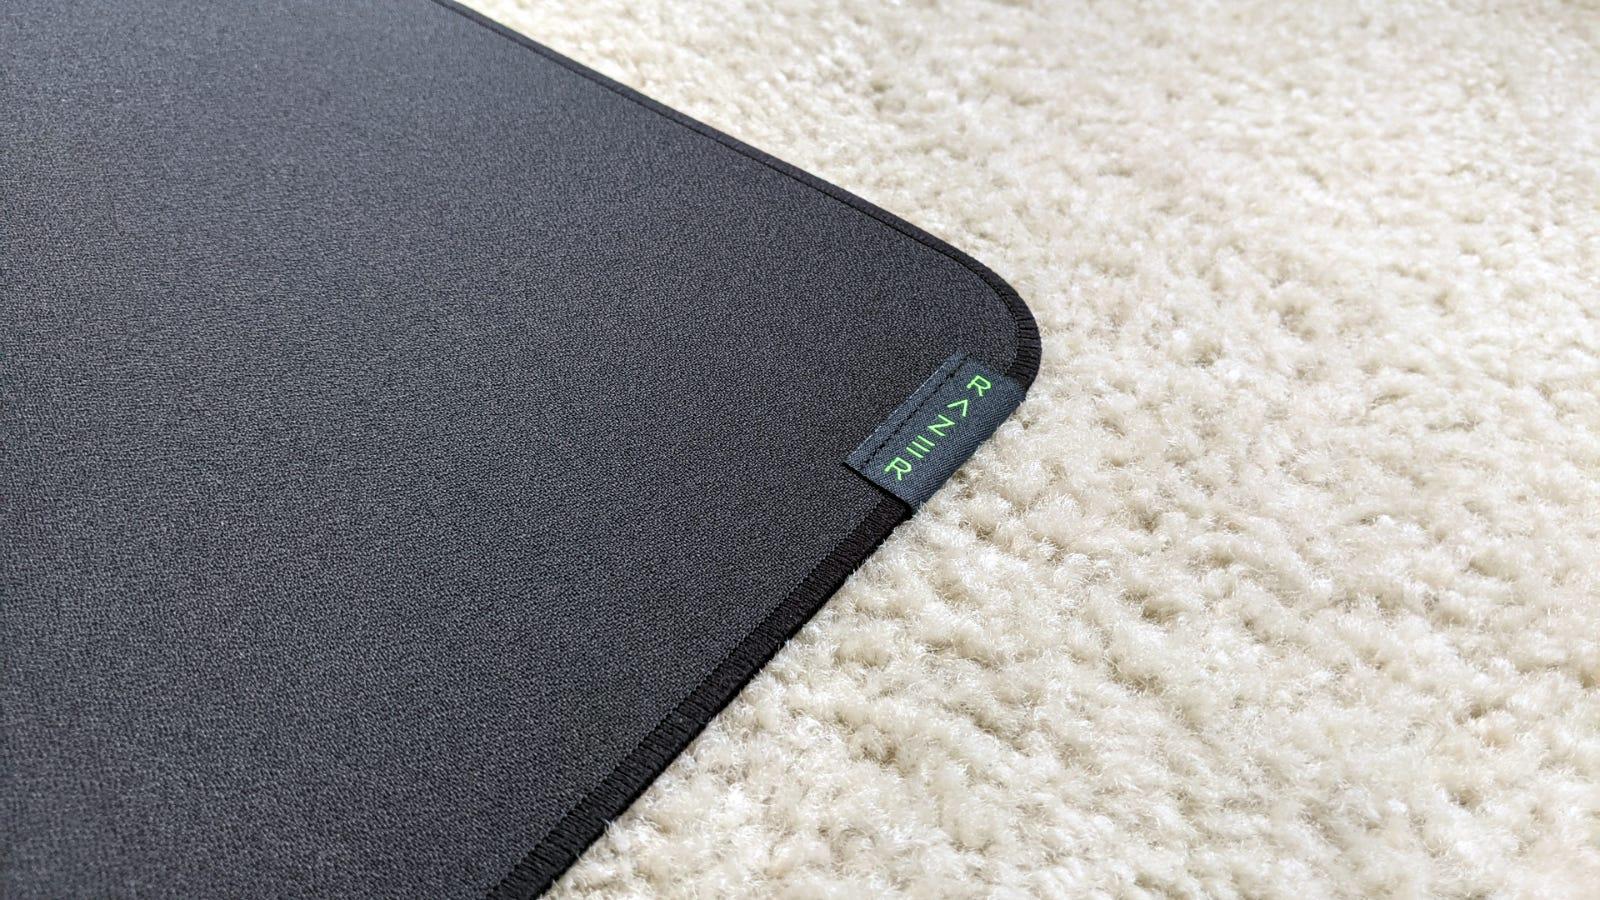 Close-up of Razer Strider mousepad stitched edge